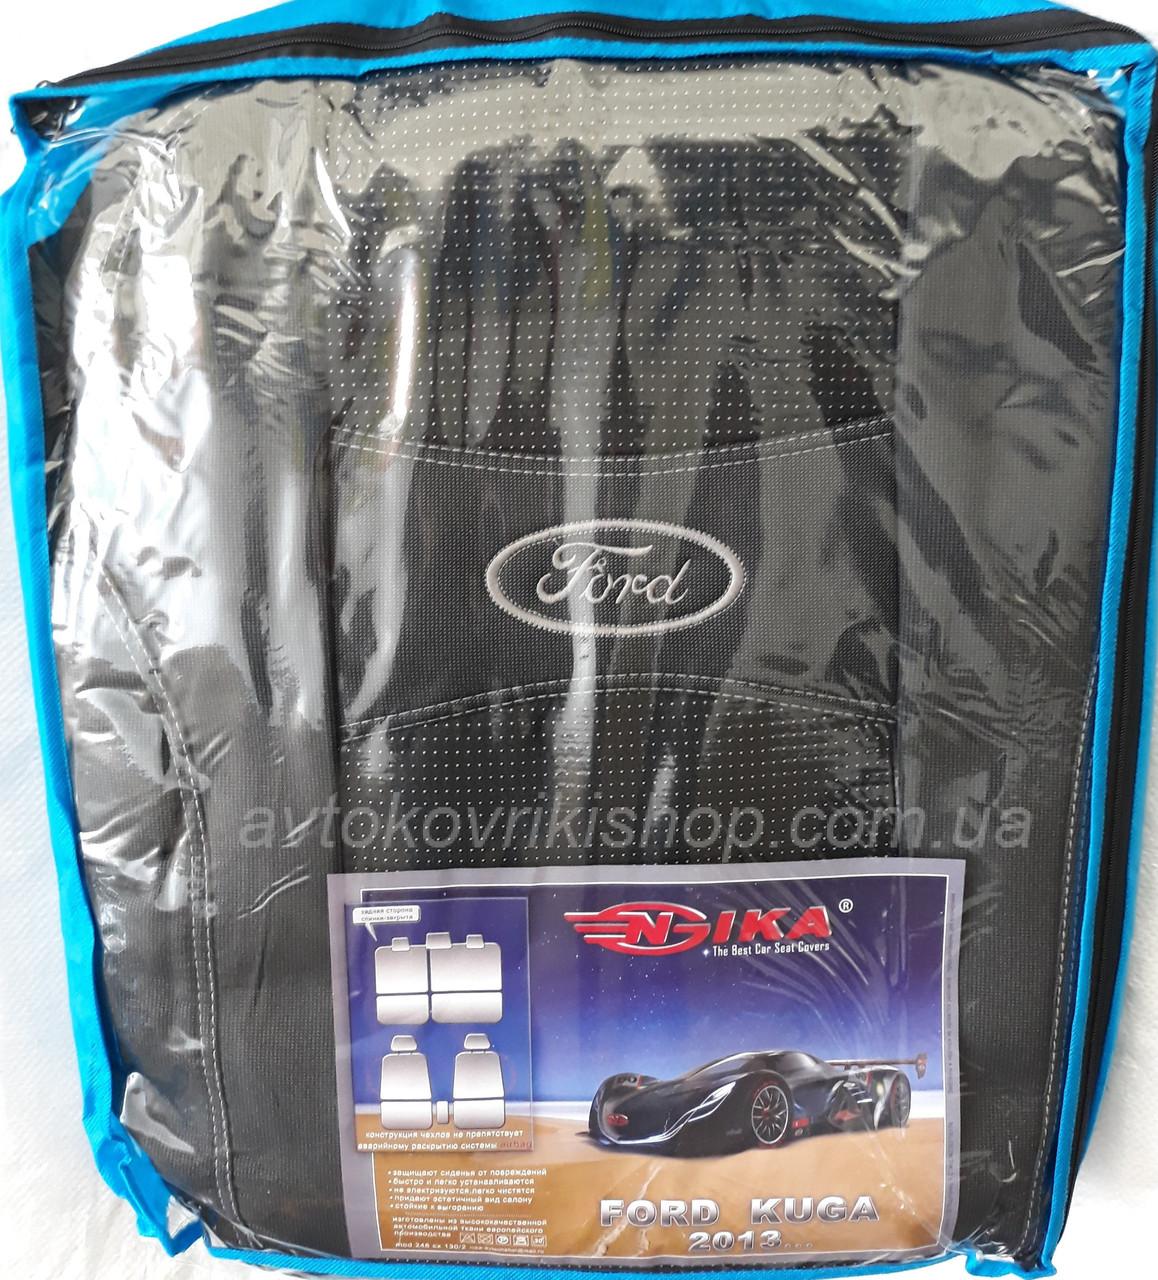 Автомобильные чехлы Ford Kuga 2013- Nika